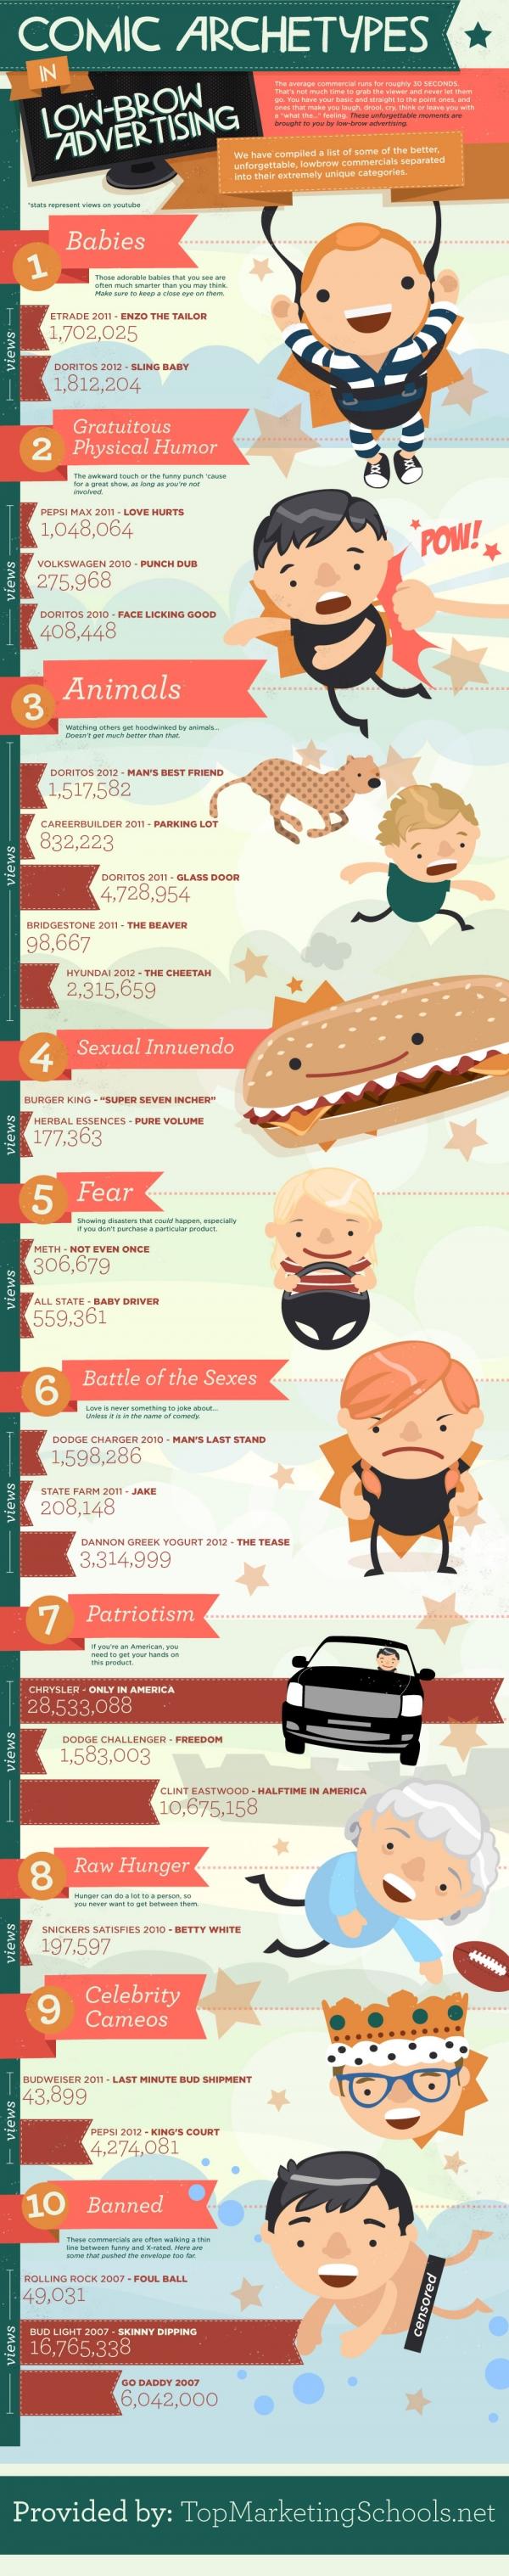 Humor in Advertising Infographic   Imagine-That-Creative.com